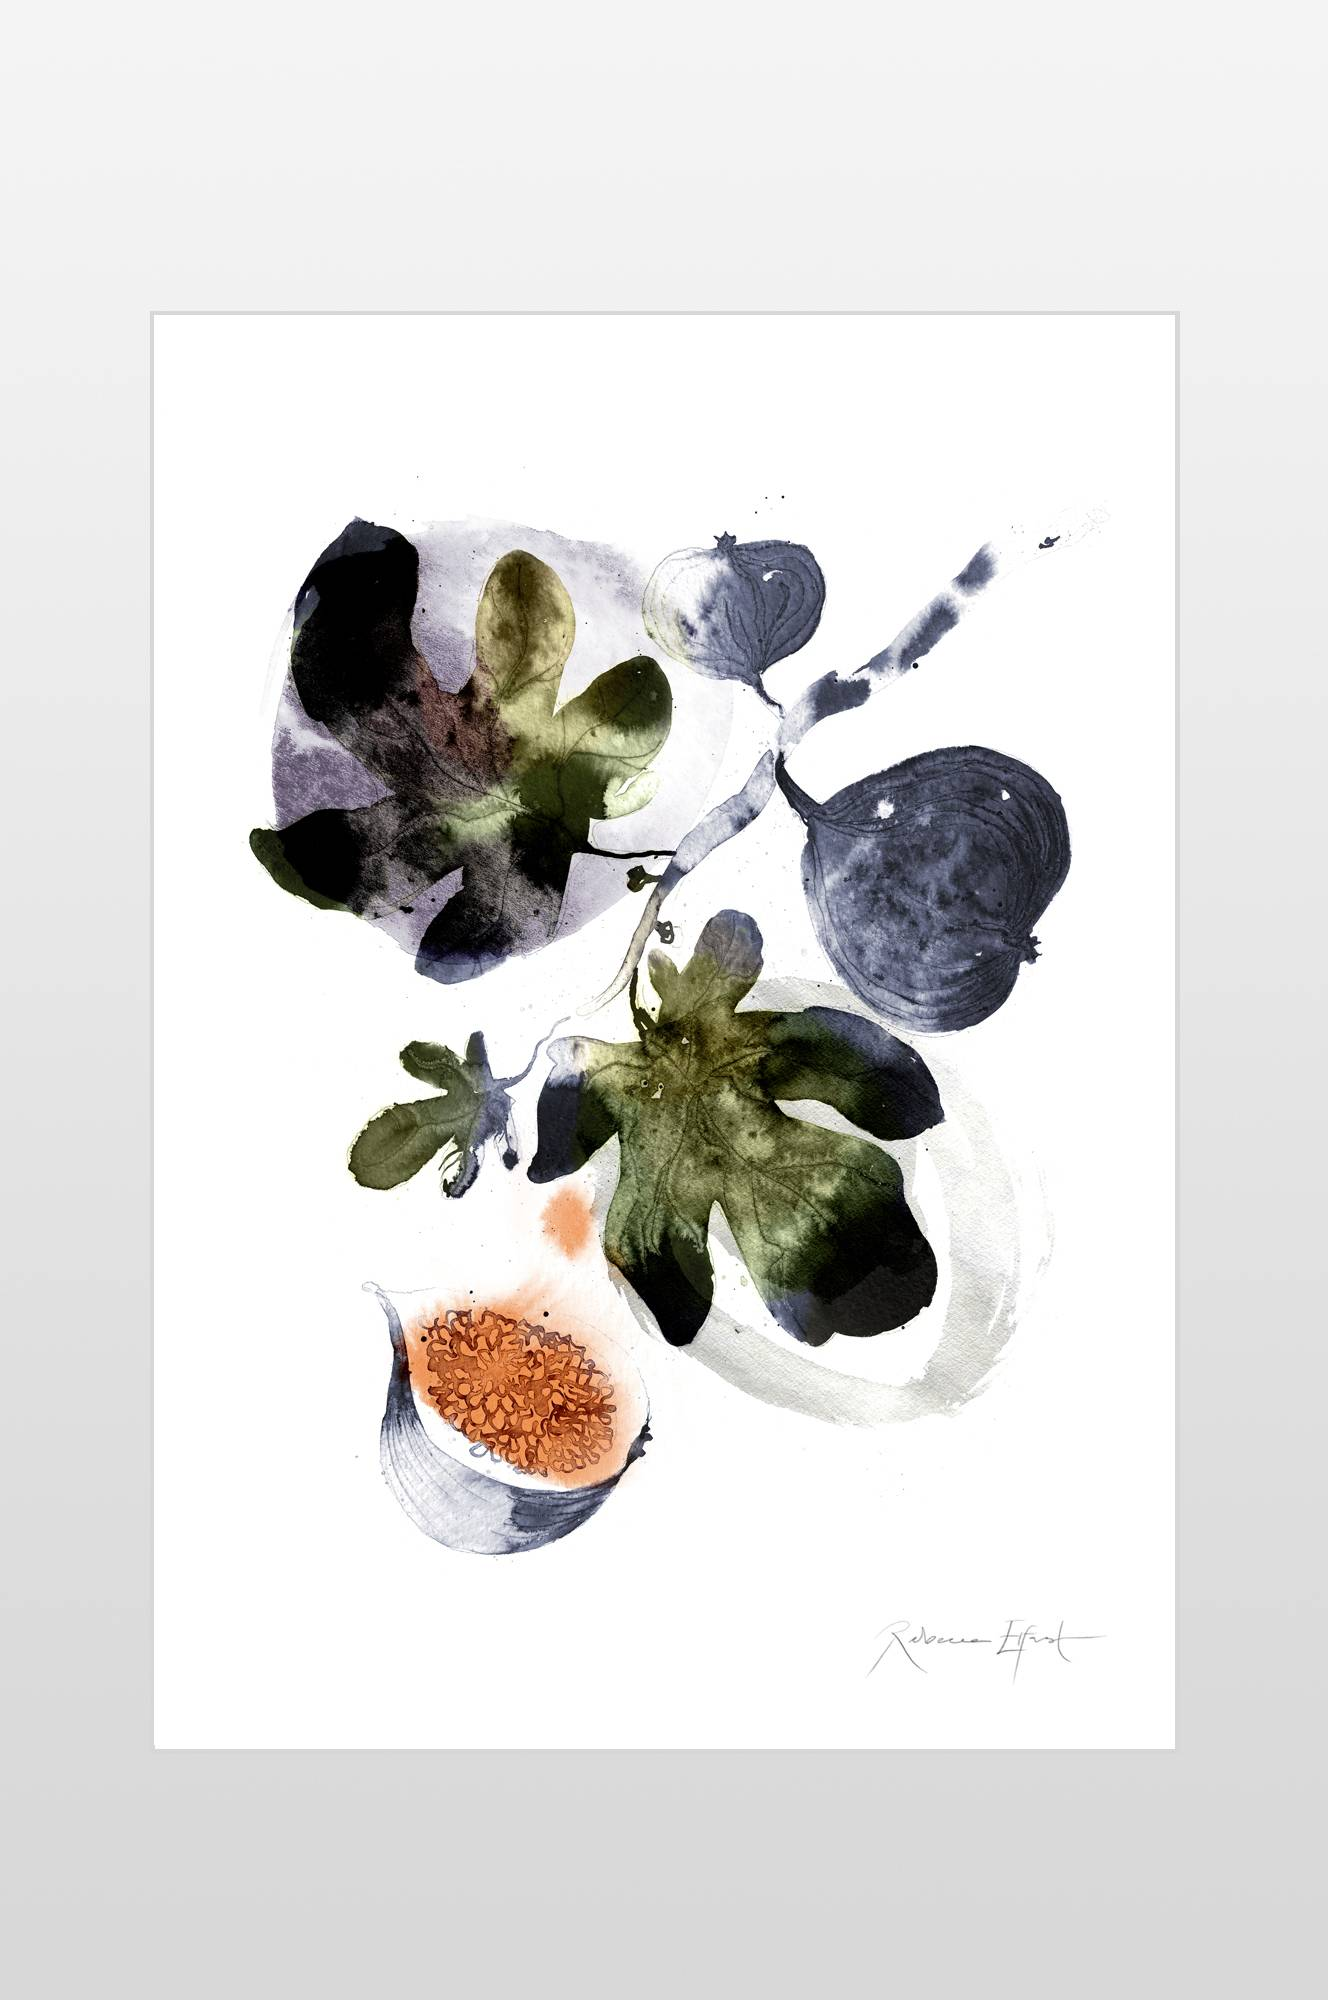 Poster Fikon 50x70 cm Ellos Posters til Boligen i Blå/grøn